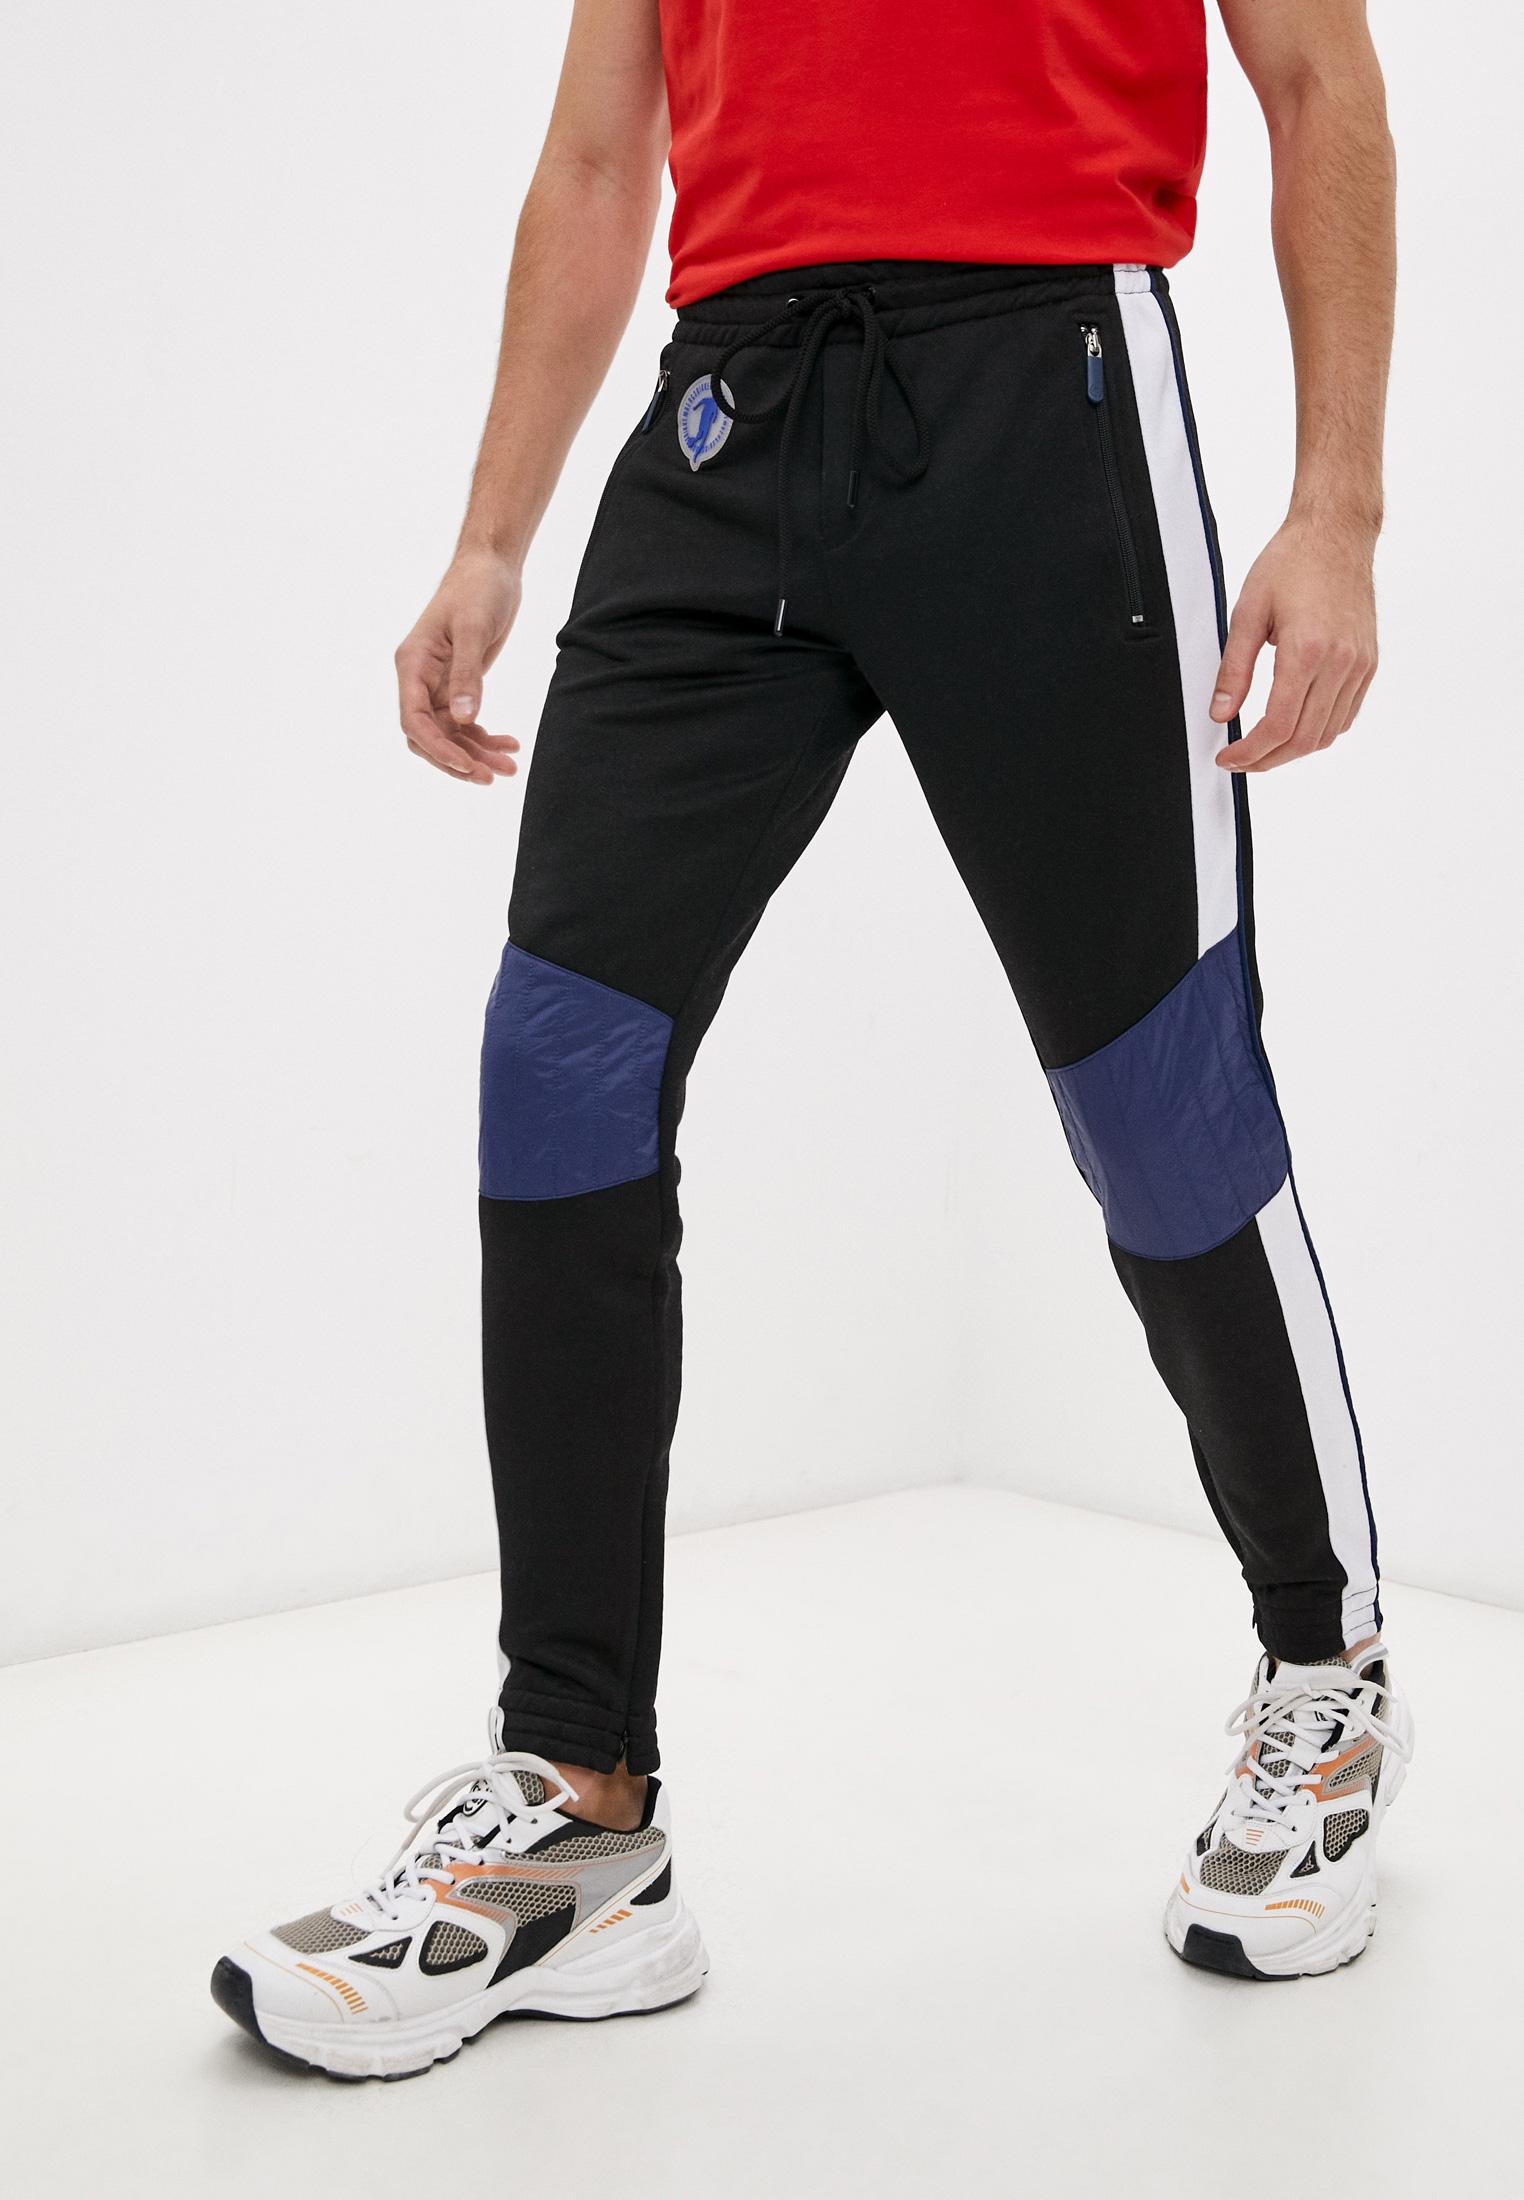 Мужские спортивные брюки Bikkembergs (Биккембергс) C 1 102 00 M 4118